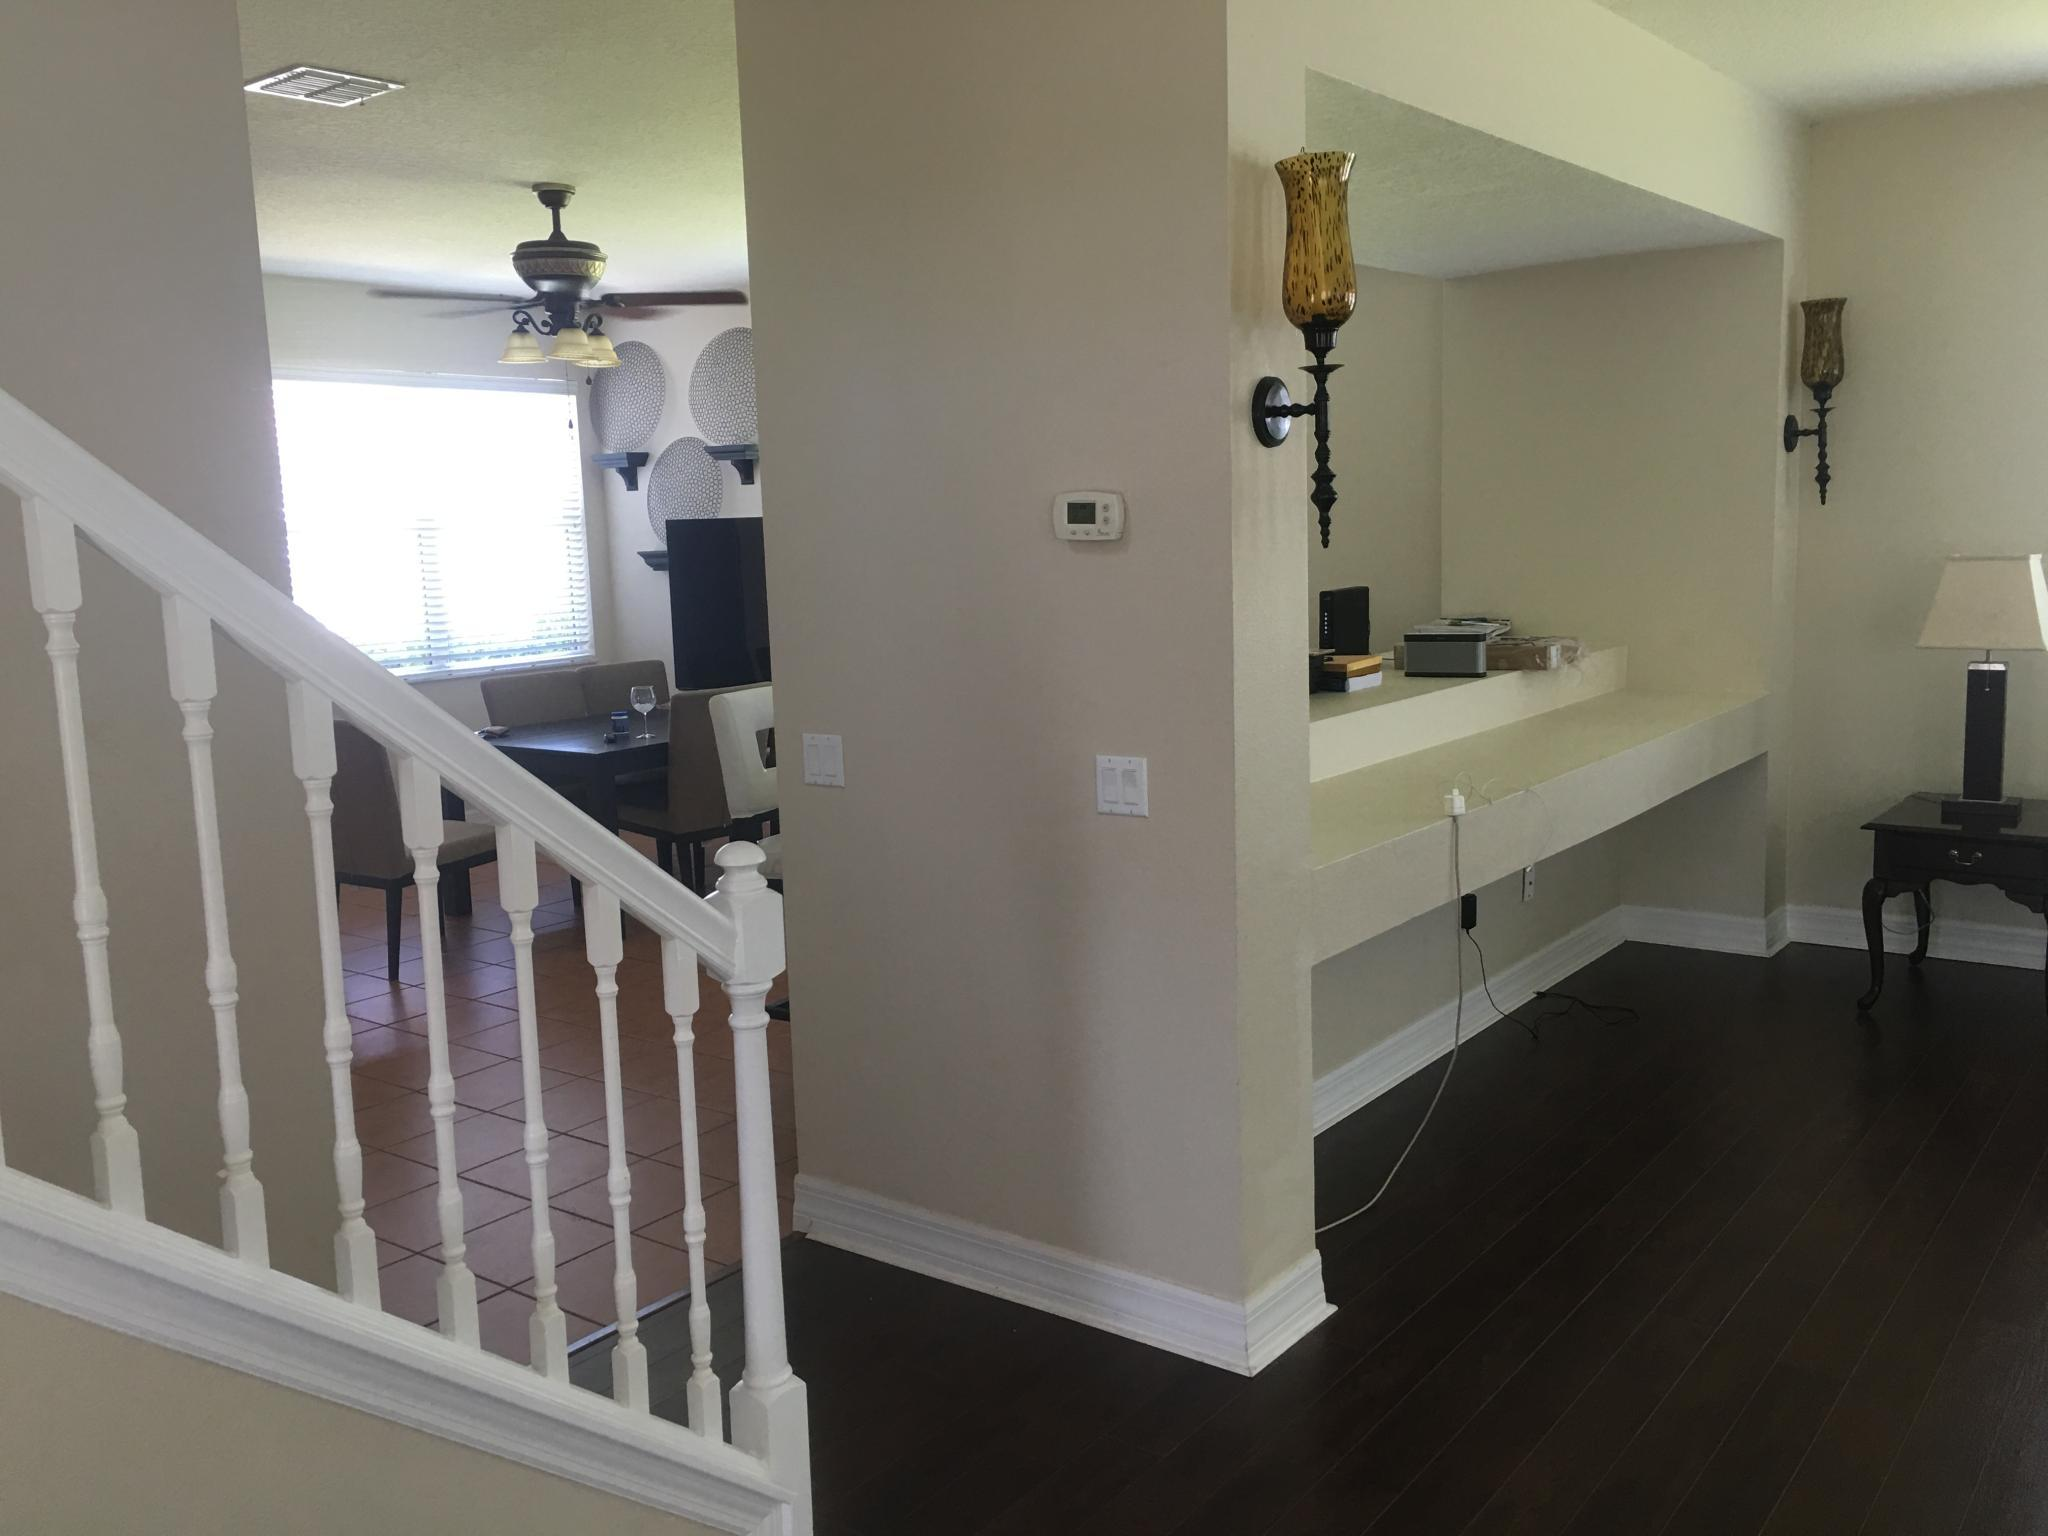 640 First Cape Coral Dr For Rent - Winter Garden, FL | Trulia